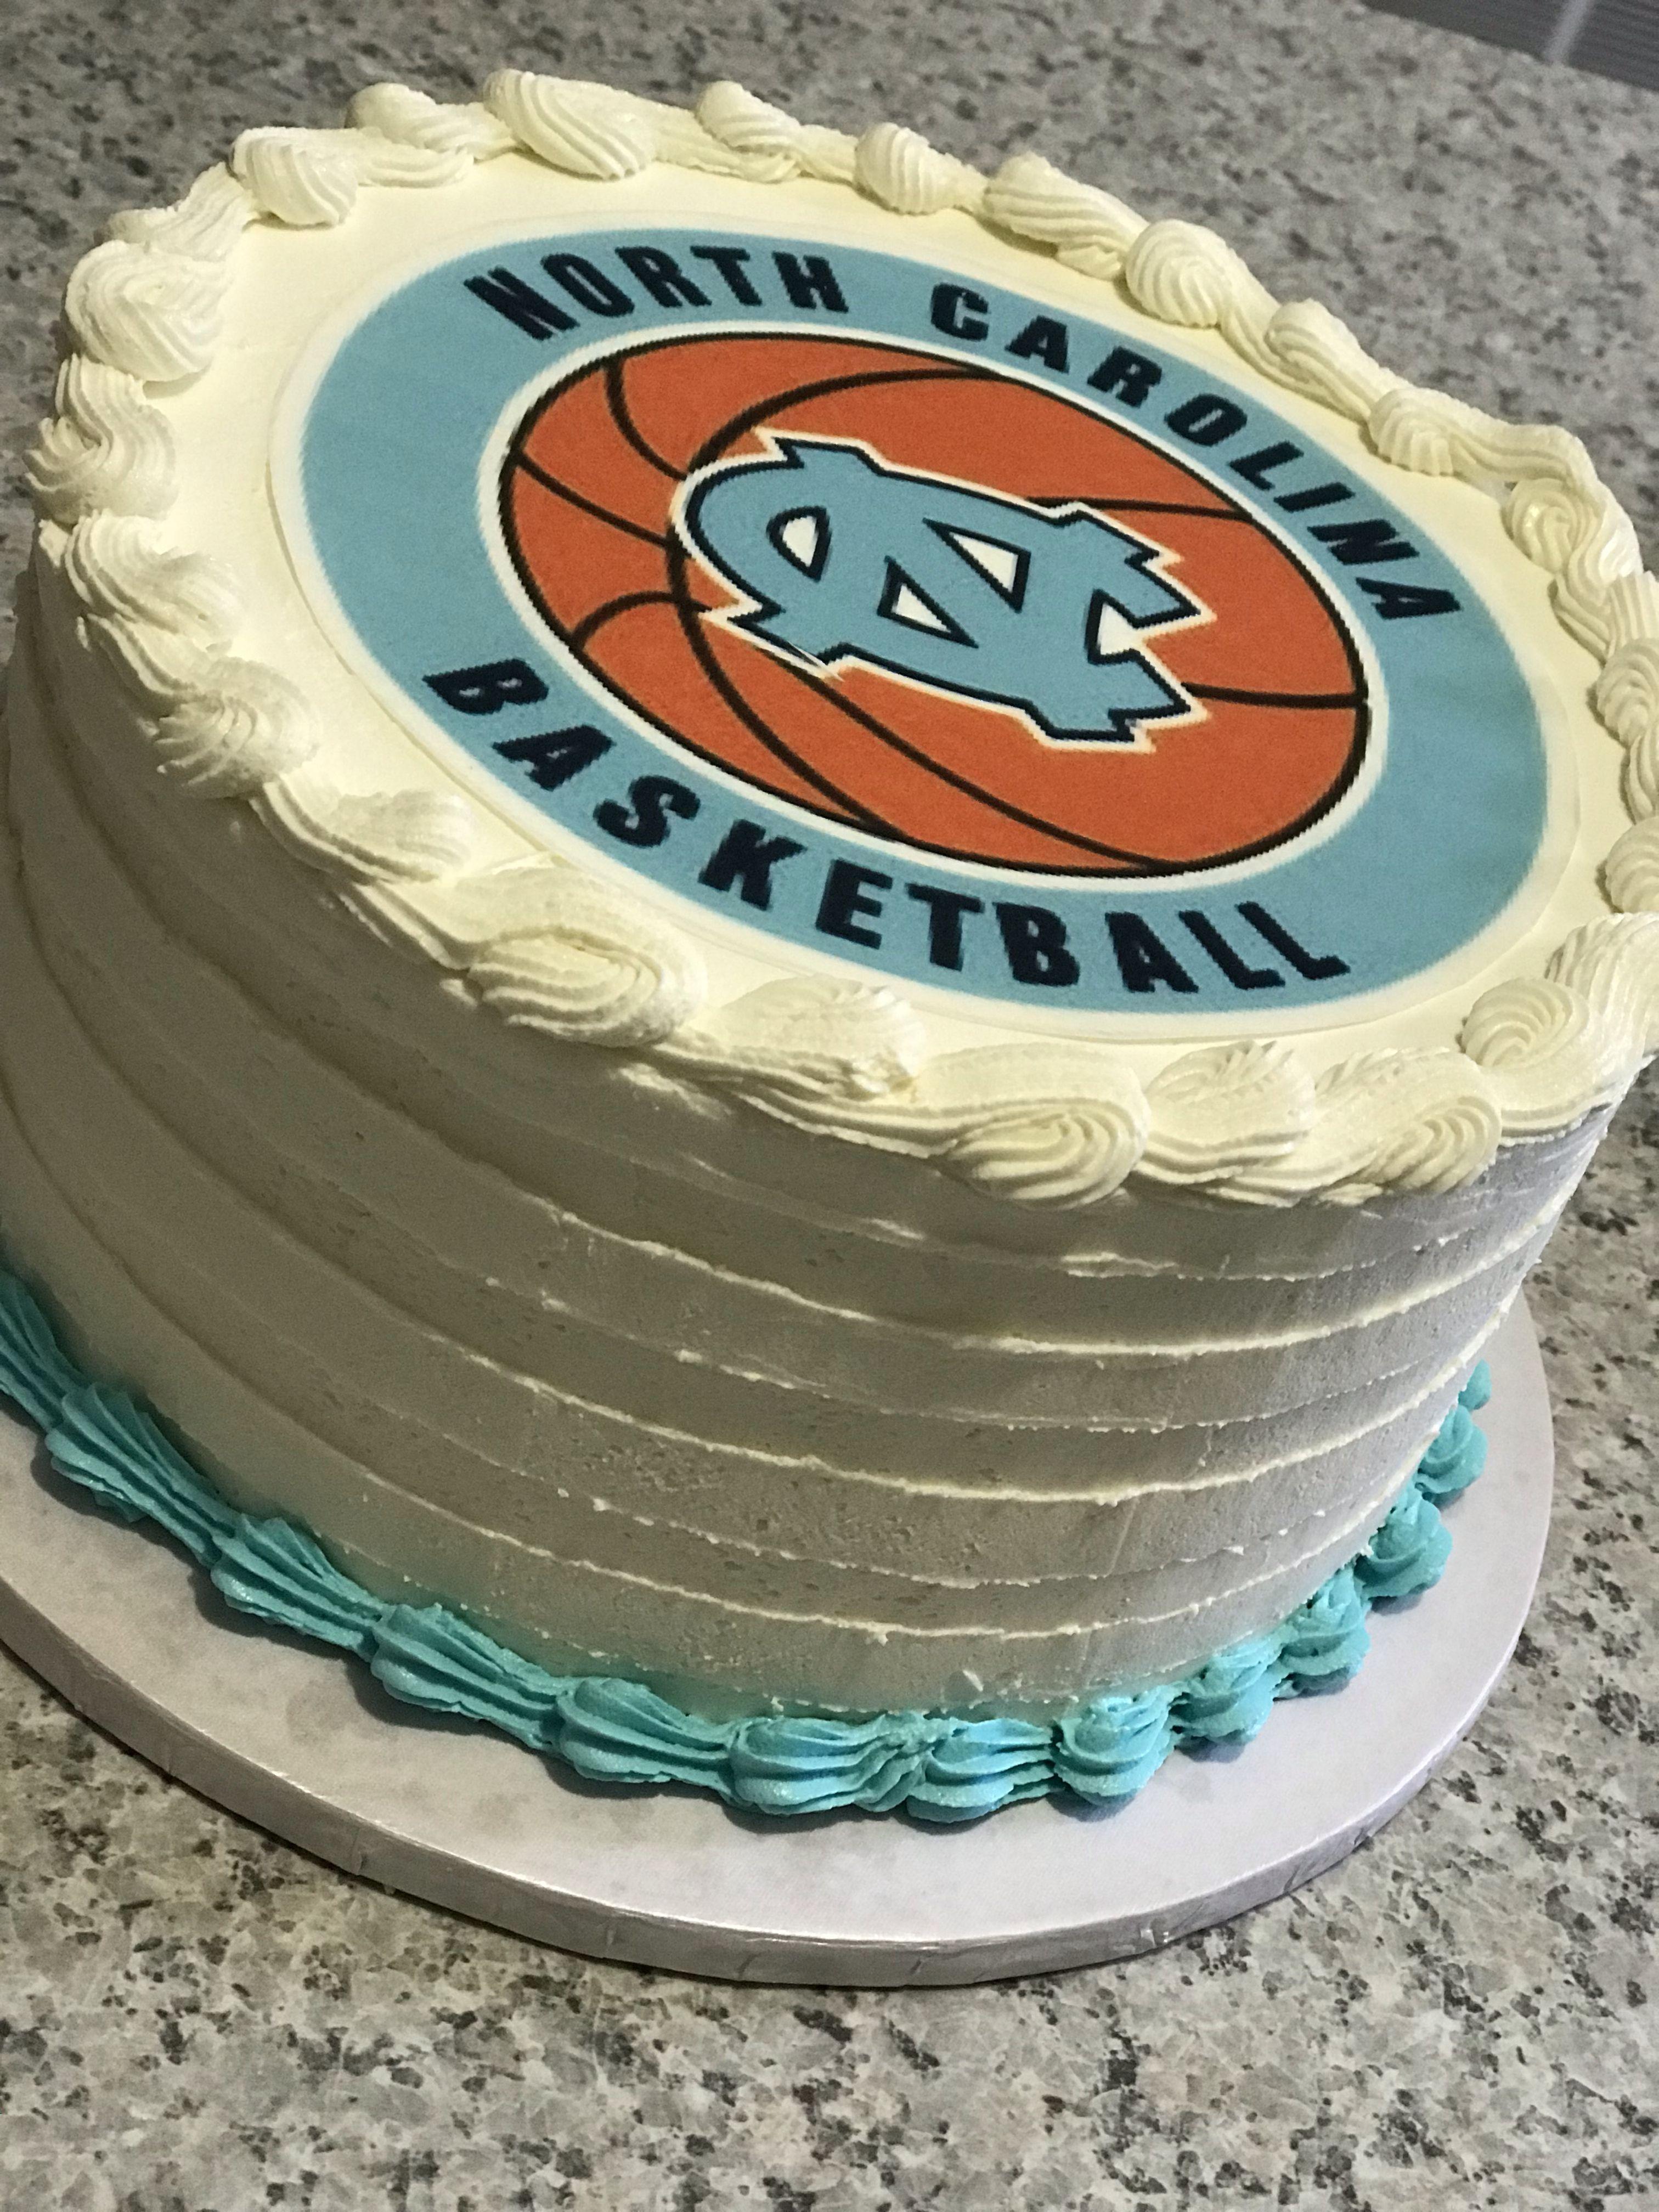 UNC Tarheel cake Buttercream frosting, Edible images